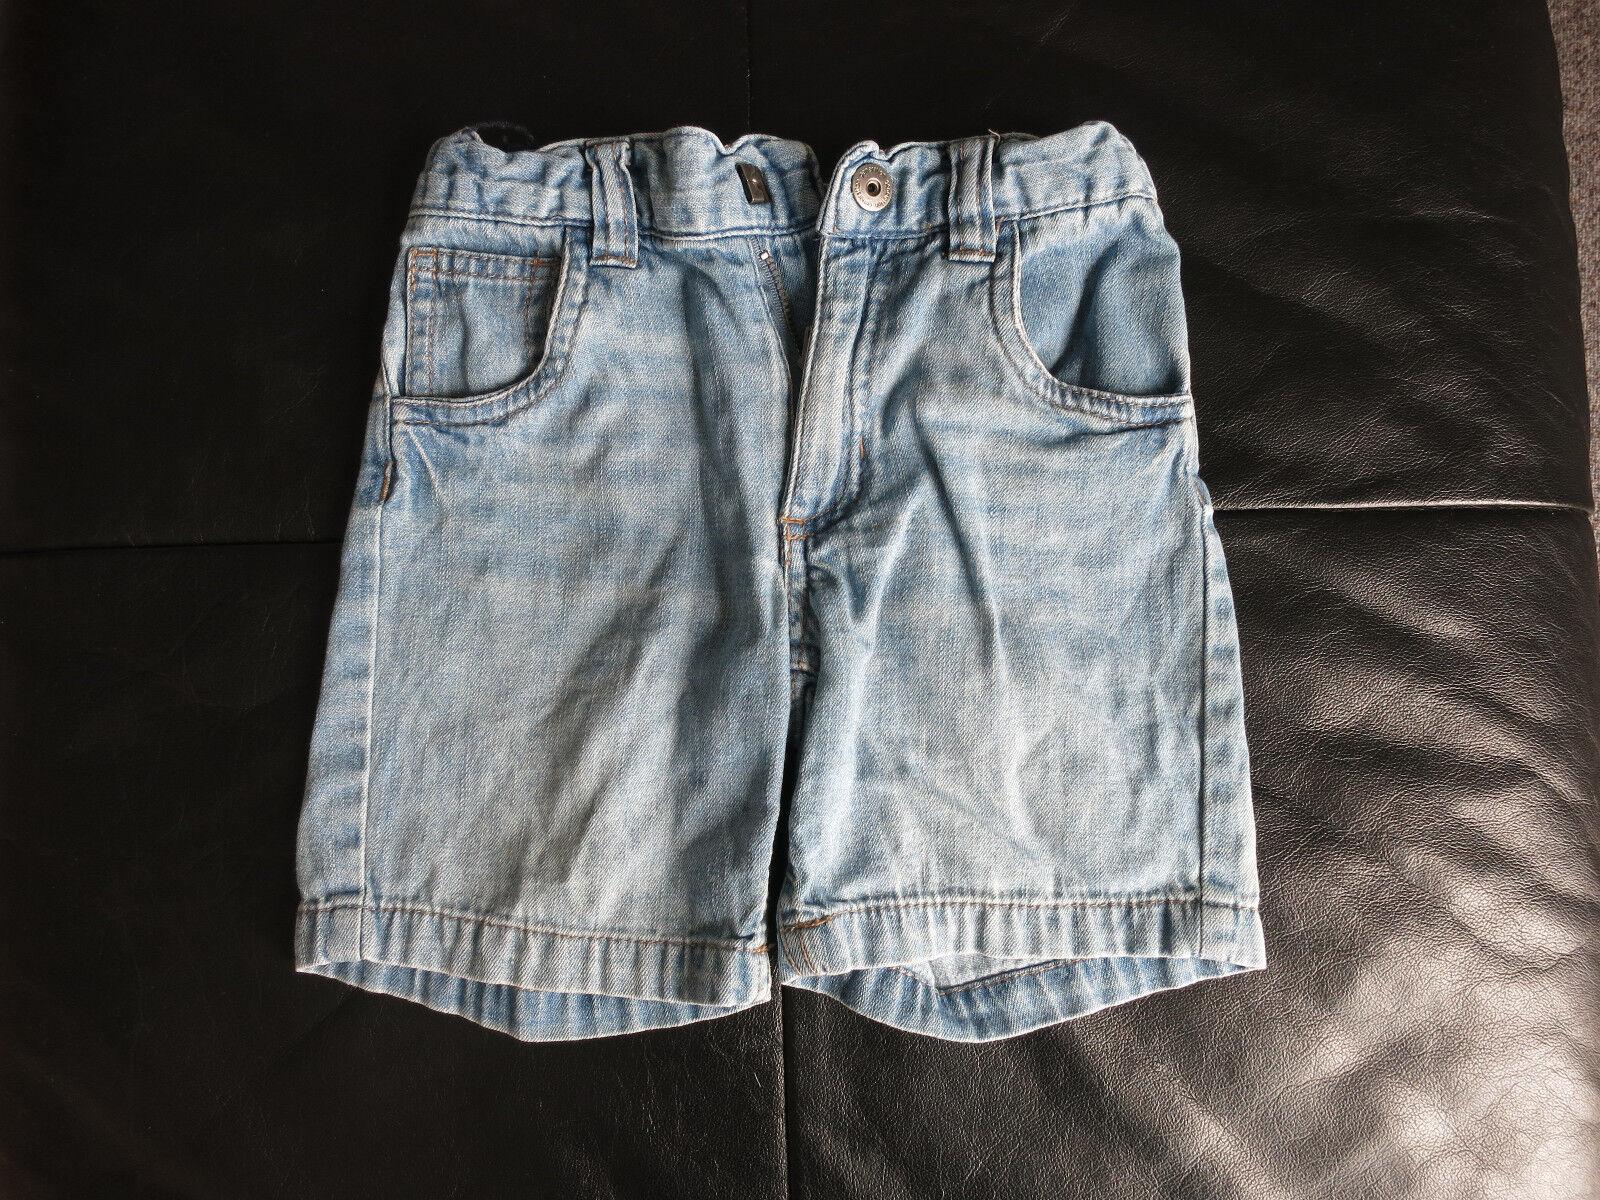 Hosen Kinder Sommerhose Jeanshose kurz Gr. 98_104 Shorts kurze Hosen Jeans